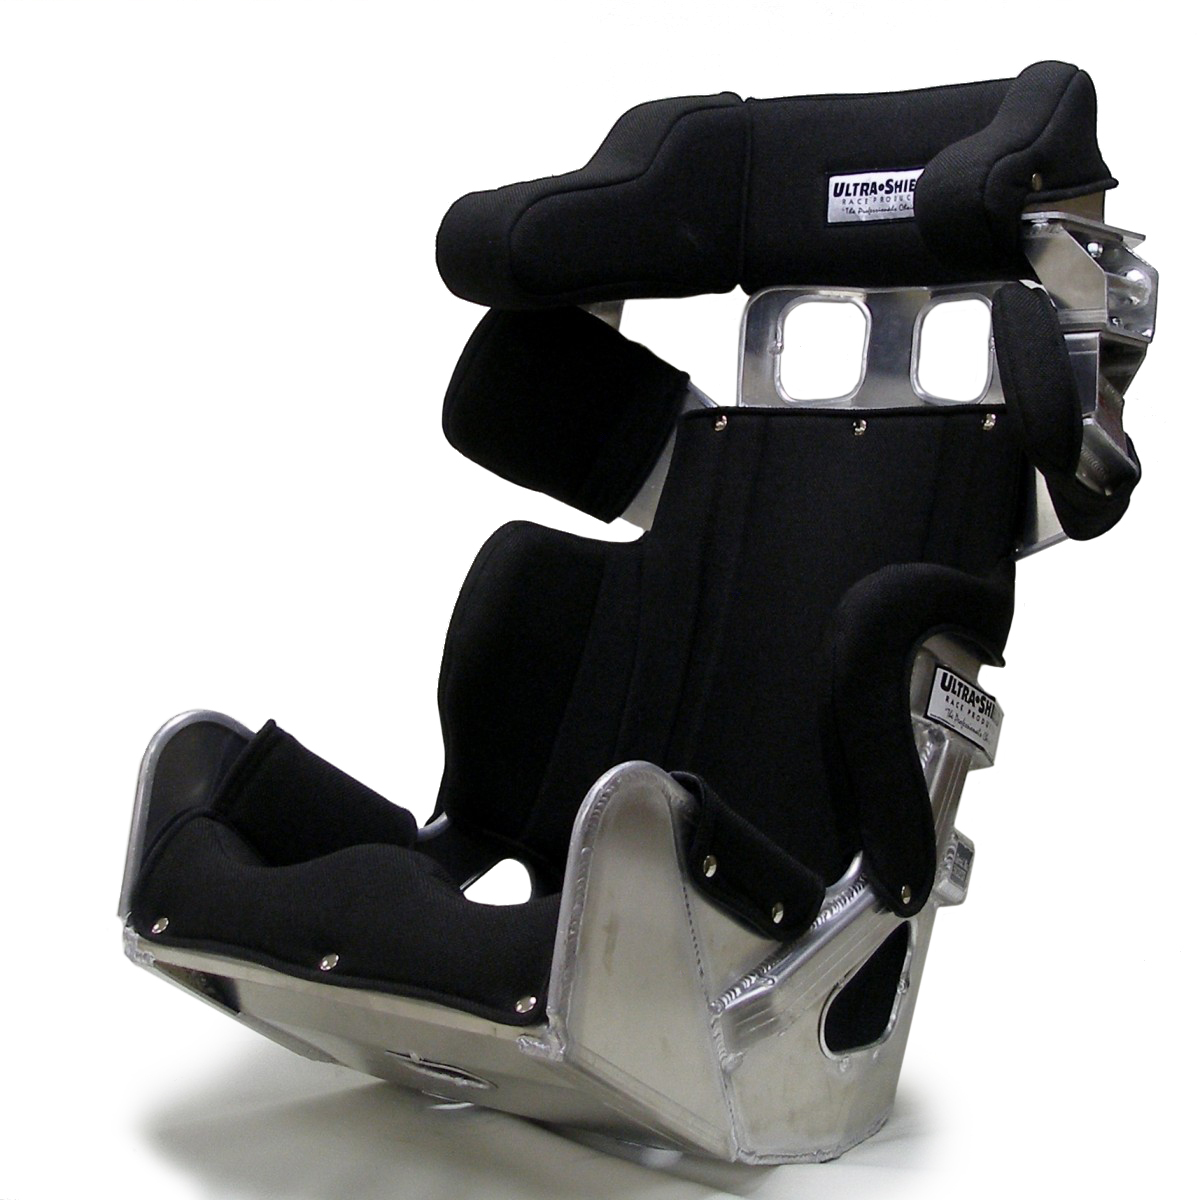 17.5in Seat W/CVR 20 Deg LM SFI 39.2 Contain